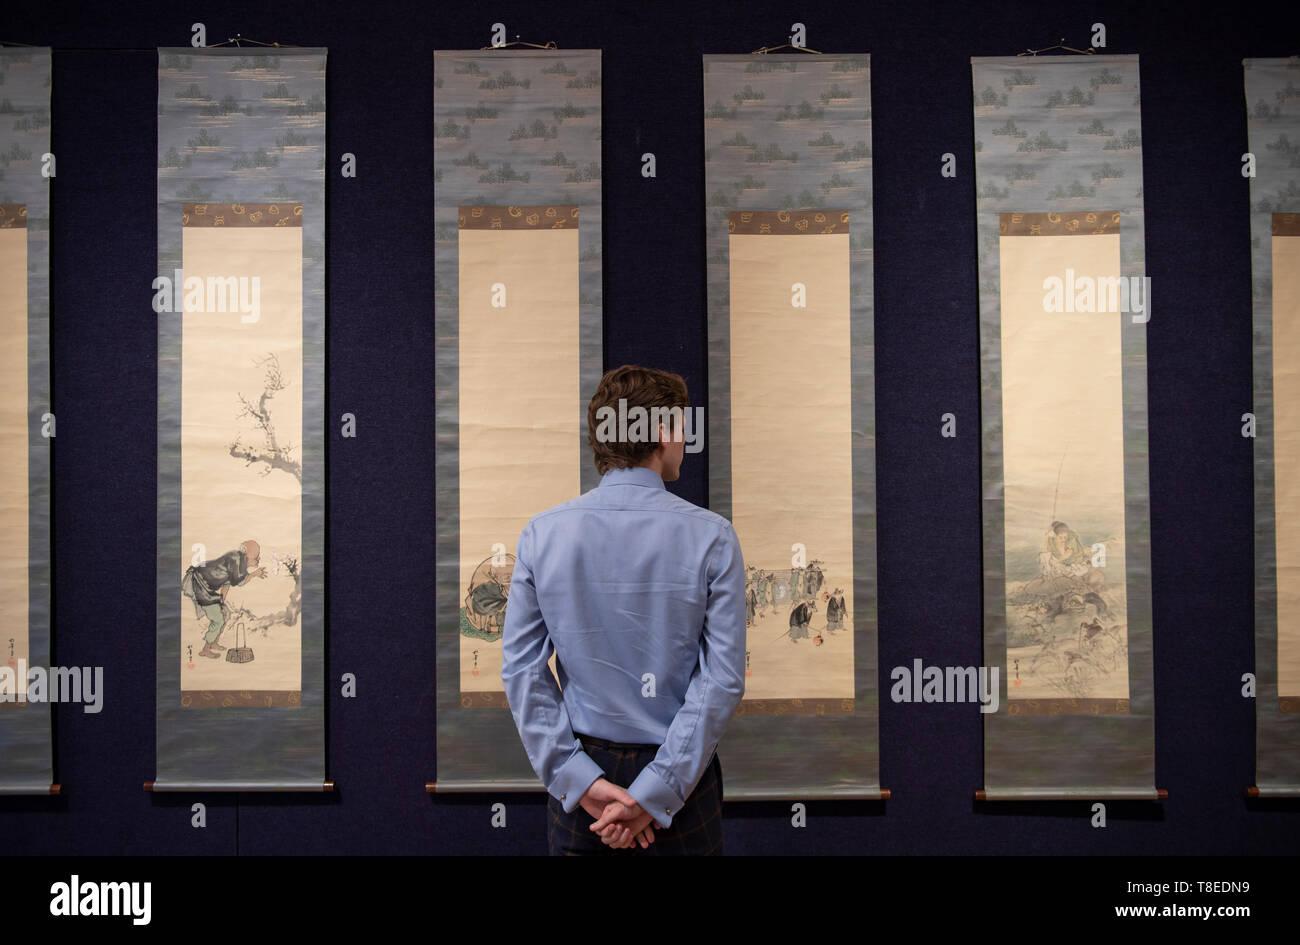 Bonhams, New Bond Street, London, UK. 13th May 2019. Suzuki Shonen (1849-1918). Meji or Taisho era, early 20th century set of 12 kakejiku (vertical hanging scrolls) carries an estimate of £5,000-8,000 at Bonhams Fine Japanese Art sale, taking place on 16th May 2019. Credit: Malcolm Park/Alamy Live News. - Stock Image